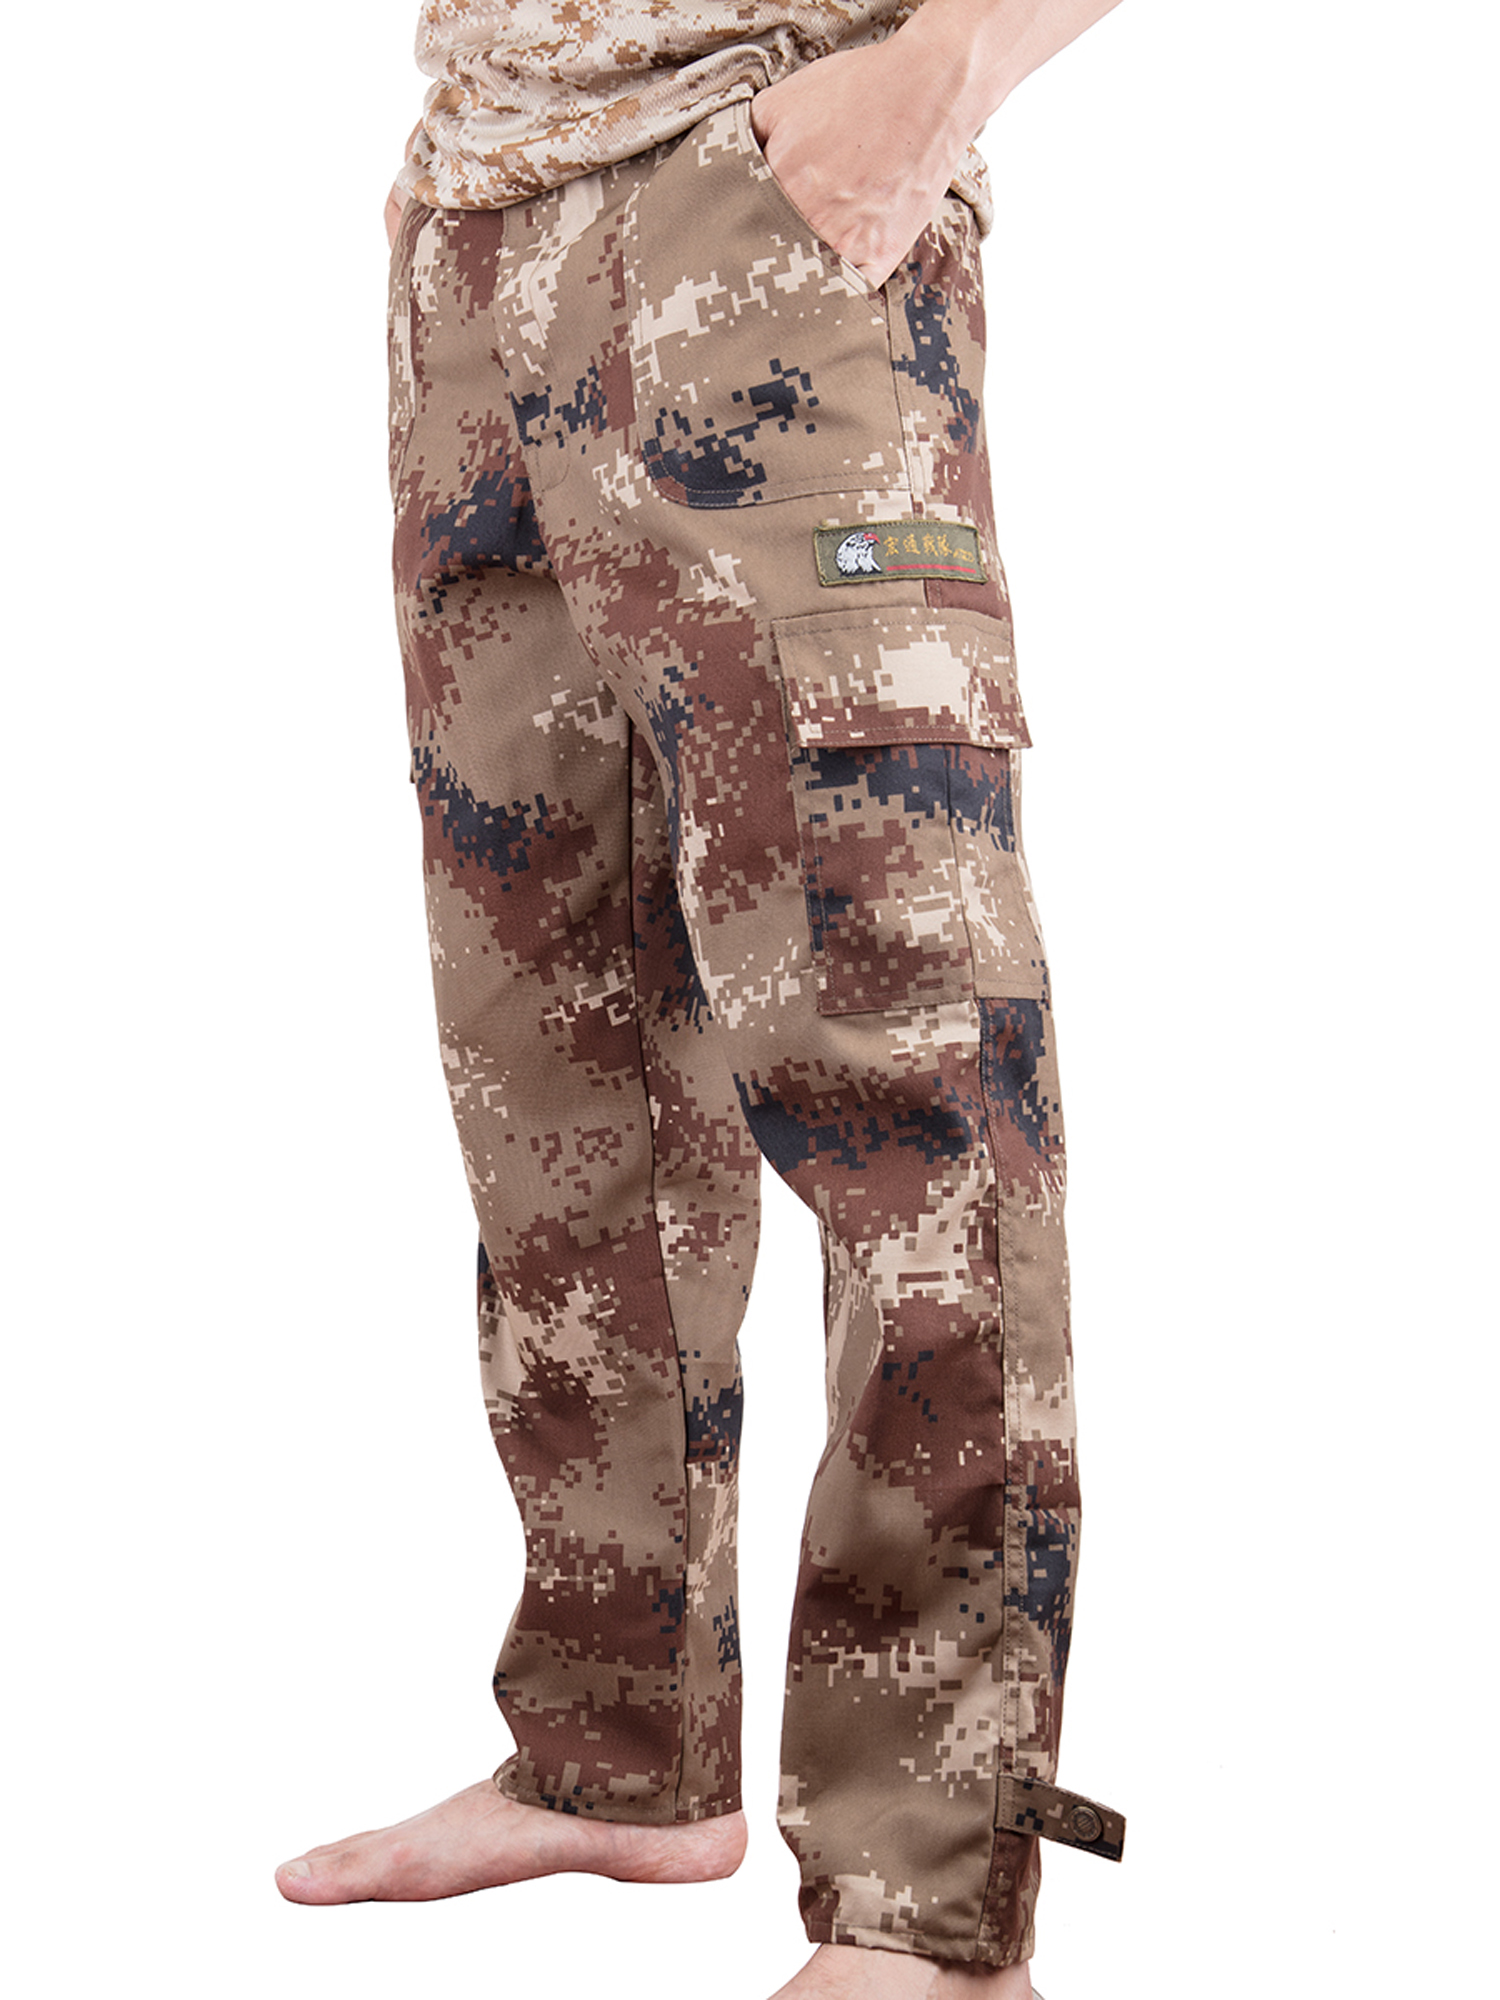 bbcccda1b063c Lelinta - LELINTA Mens Camo Pants BDU Pants Military Fatigues Kids Classic  Sweatpants Hunting Cargo Pants Desert Shadow Youth - Walmart.com